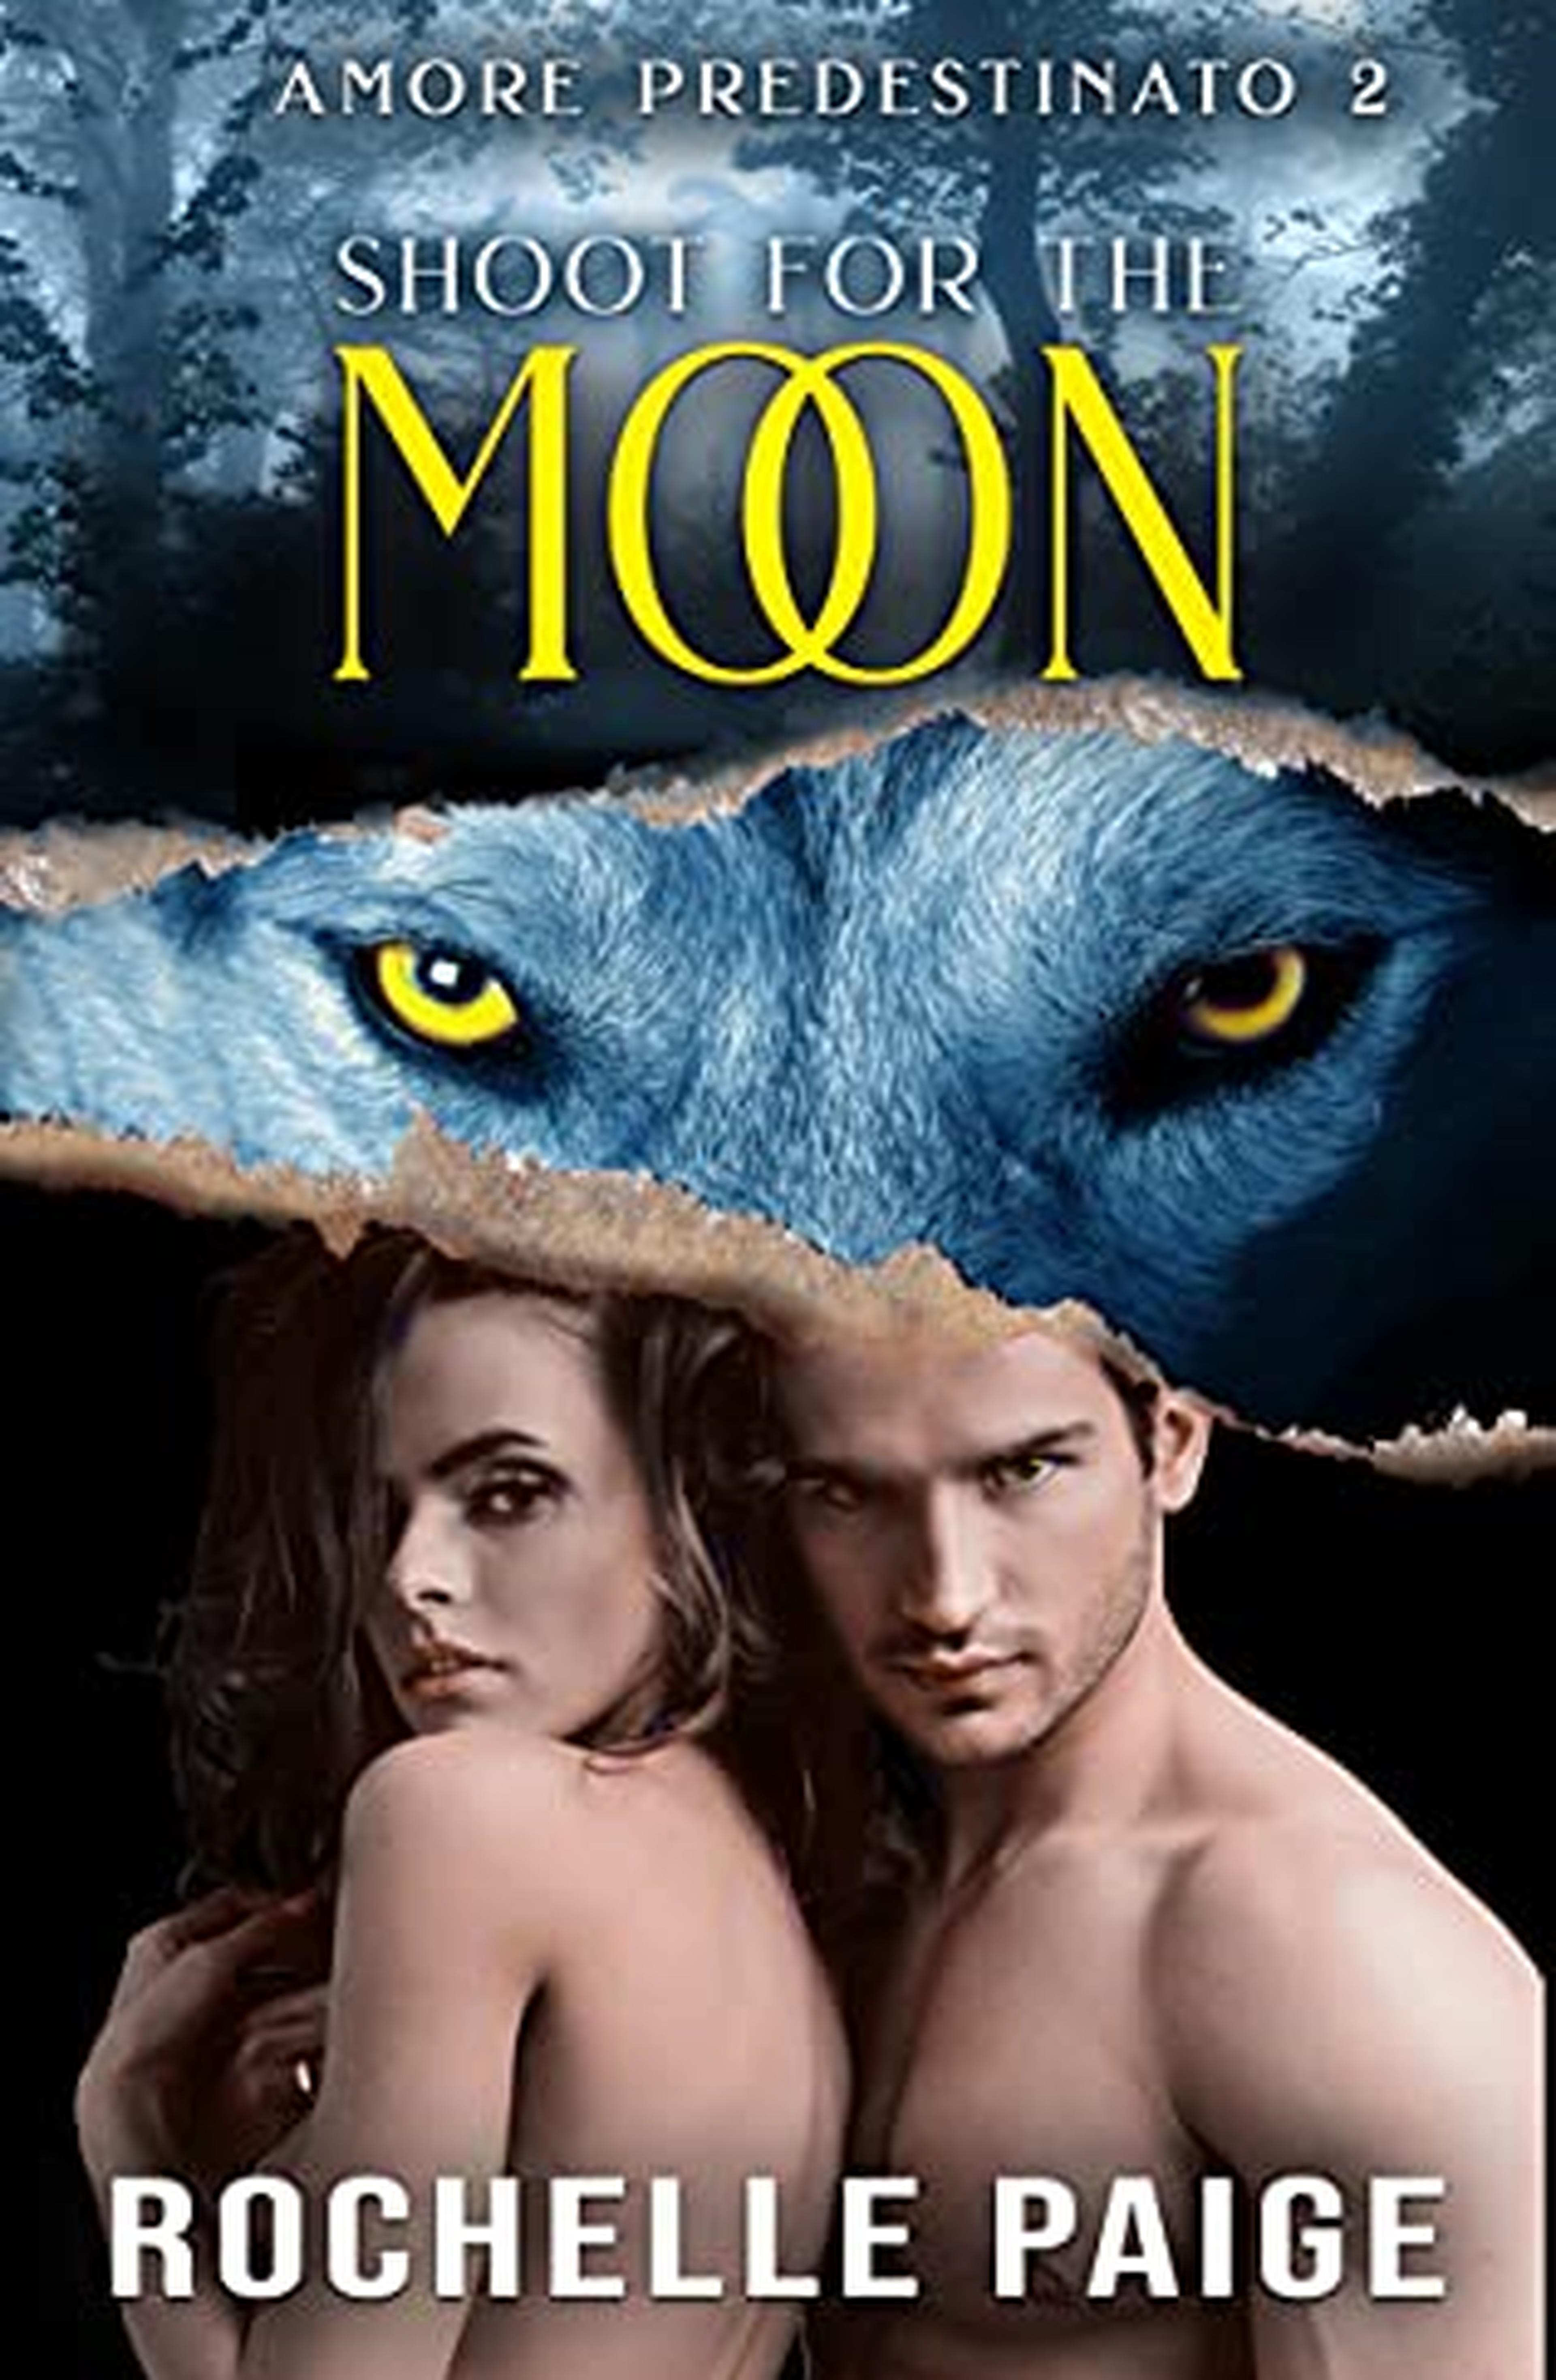 Shoot for the Moon (Amore Predestinato Vol. 2)